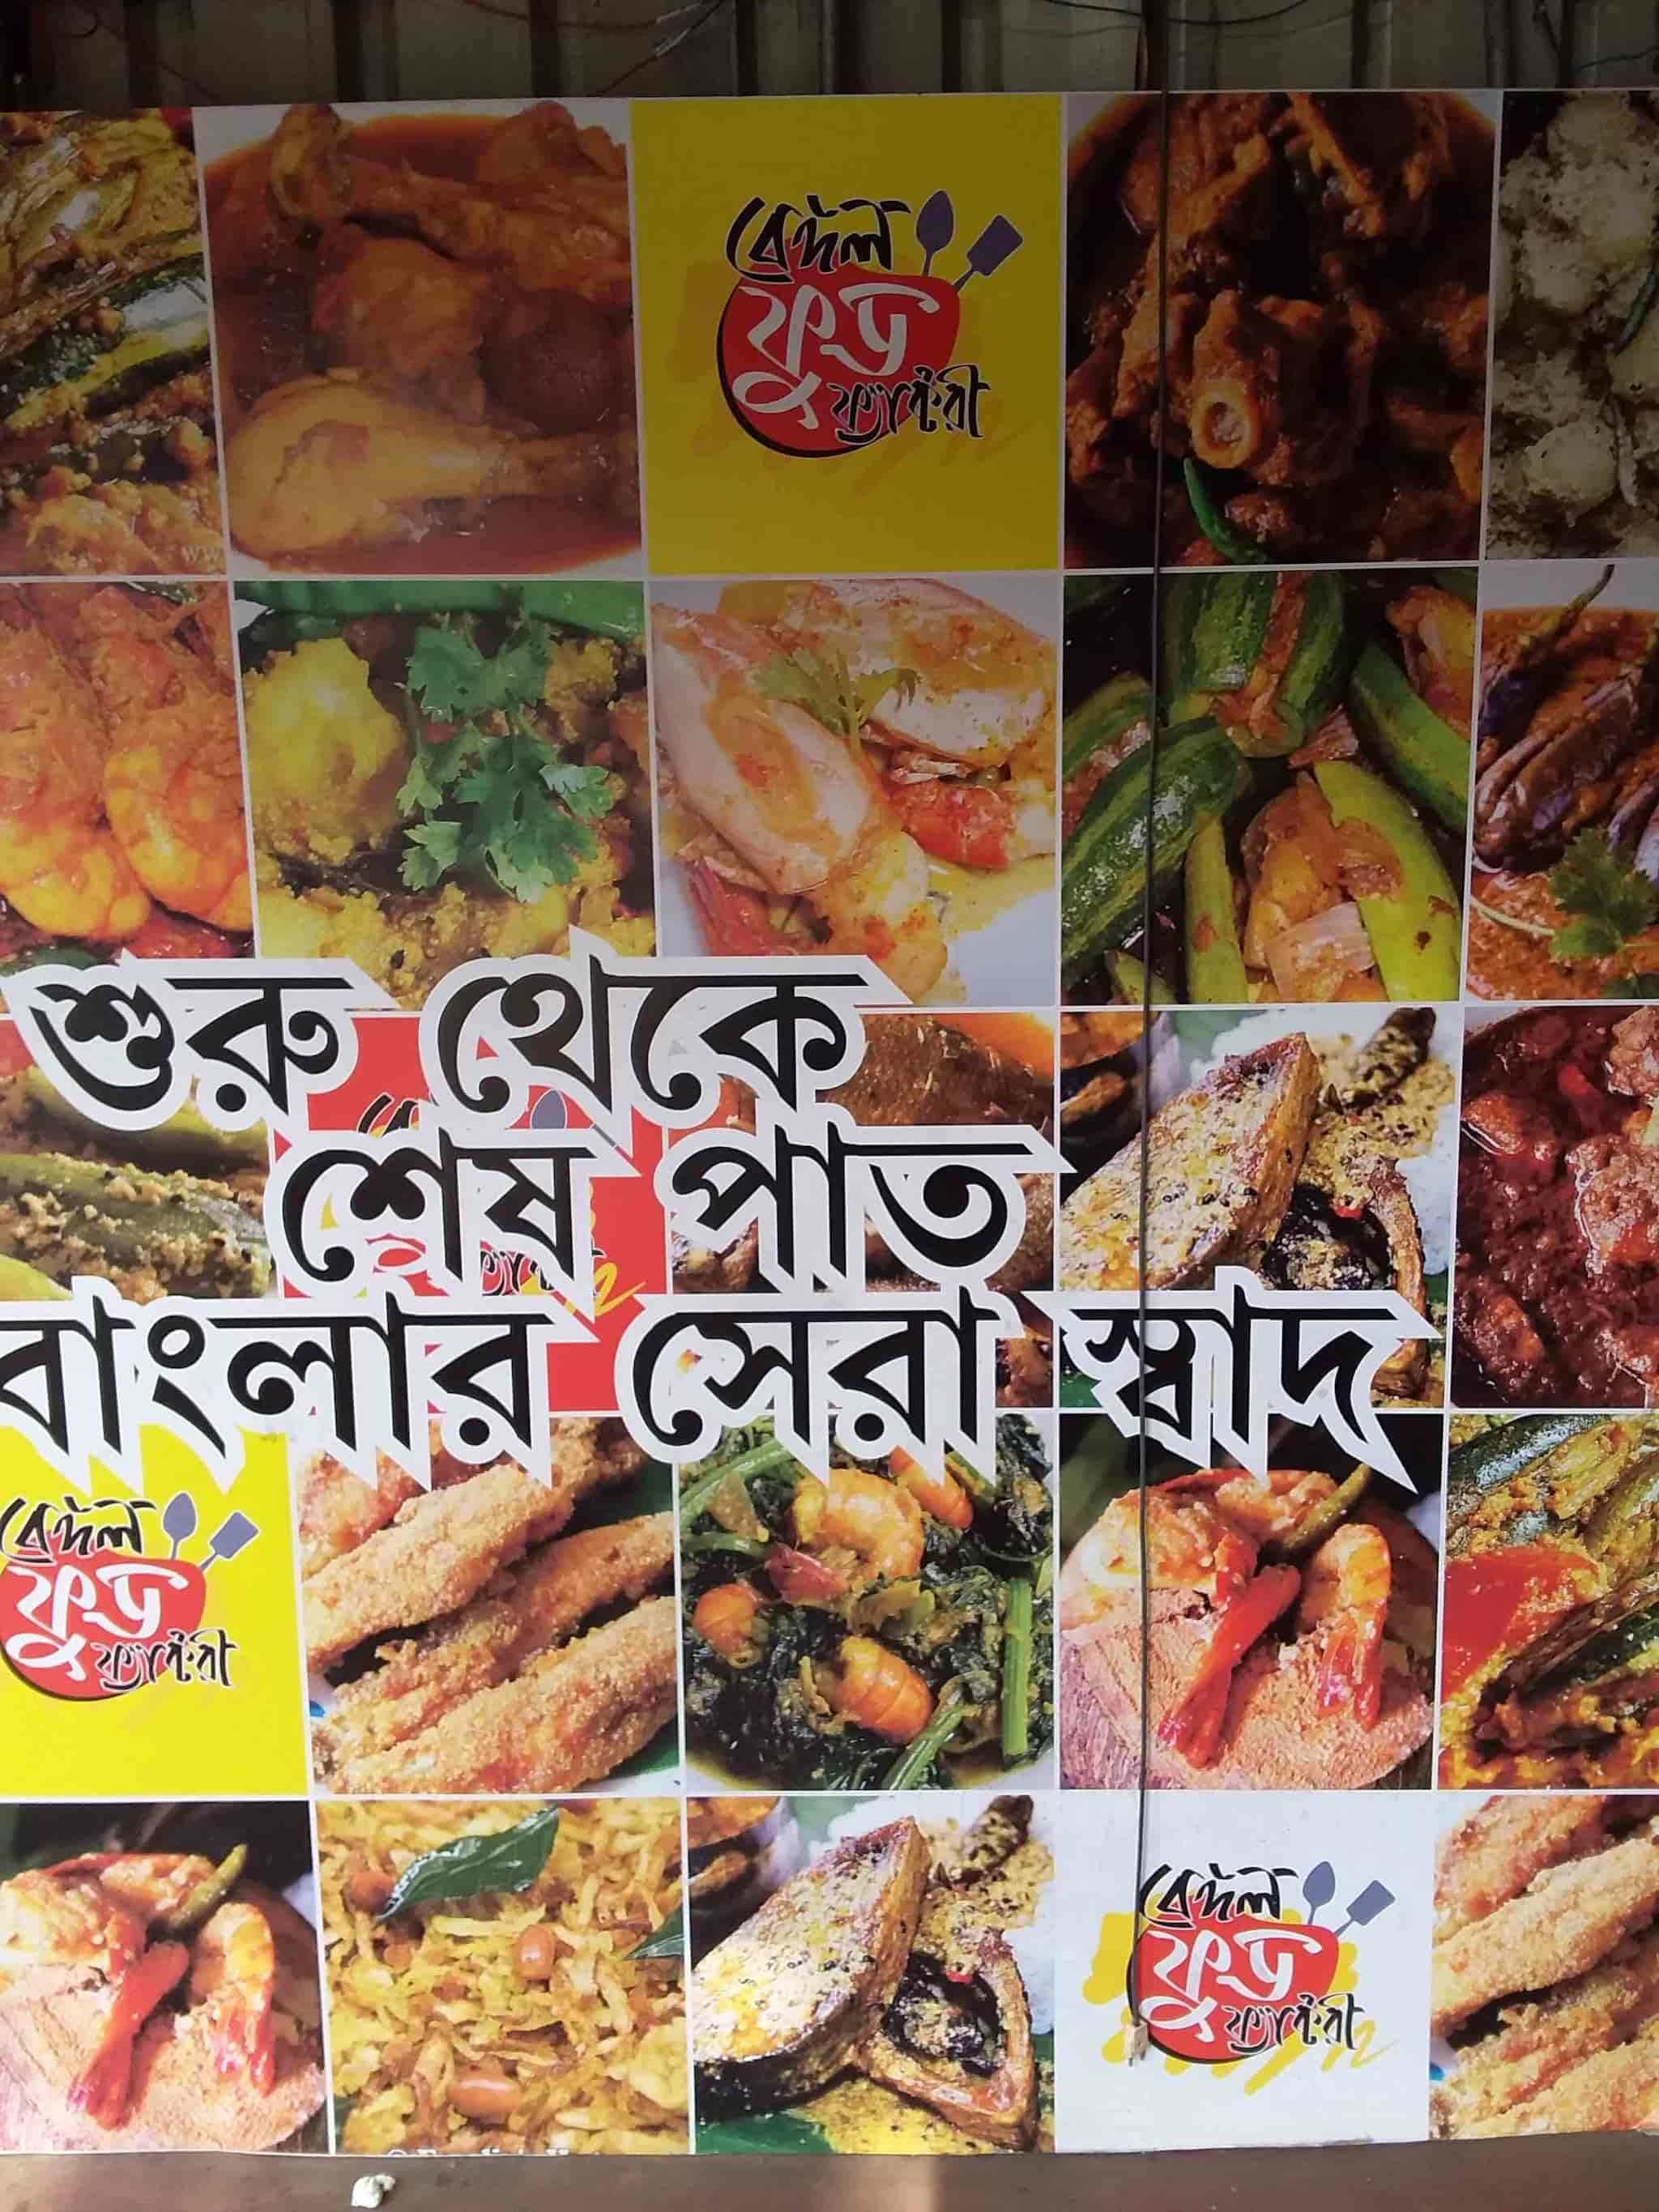 Bengal food factory photos regent park kolkata pictures images bengal food factory photos regent park kolkata bengali delivery restaurants forumfinder Choice Image